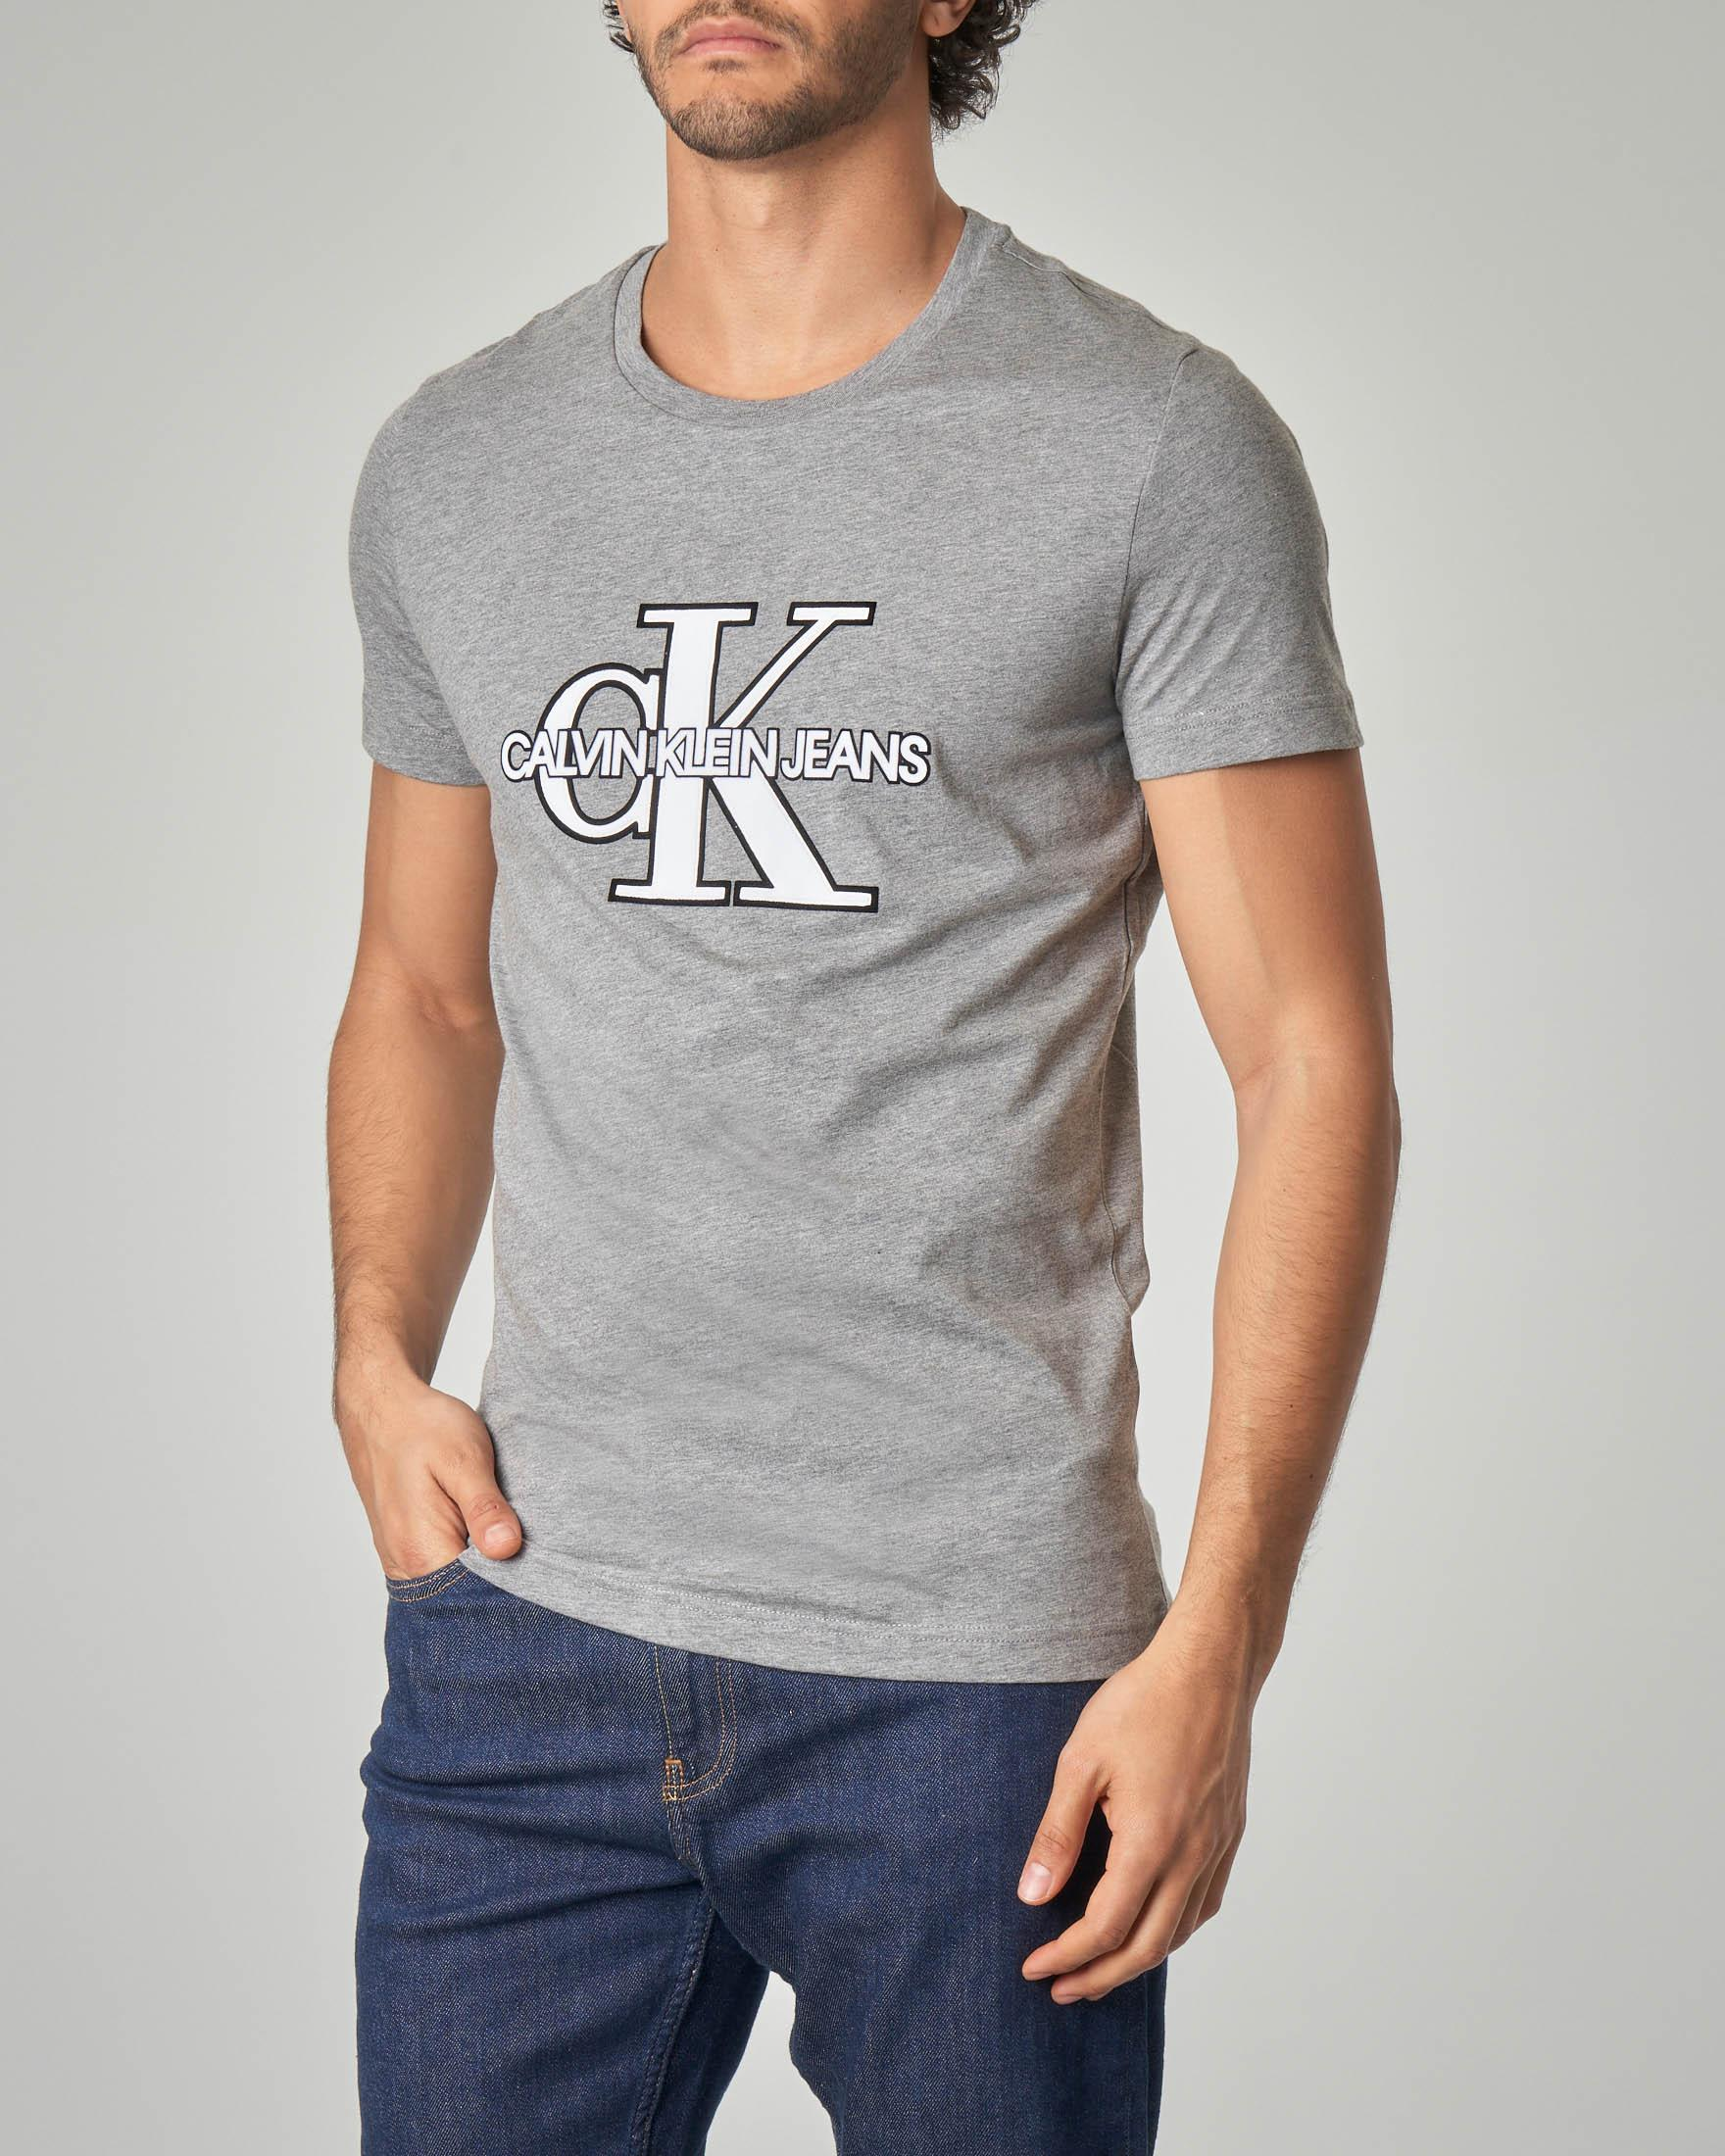 T-shirt grigia con logo CK reissue